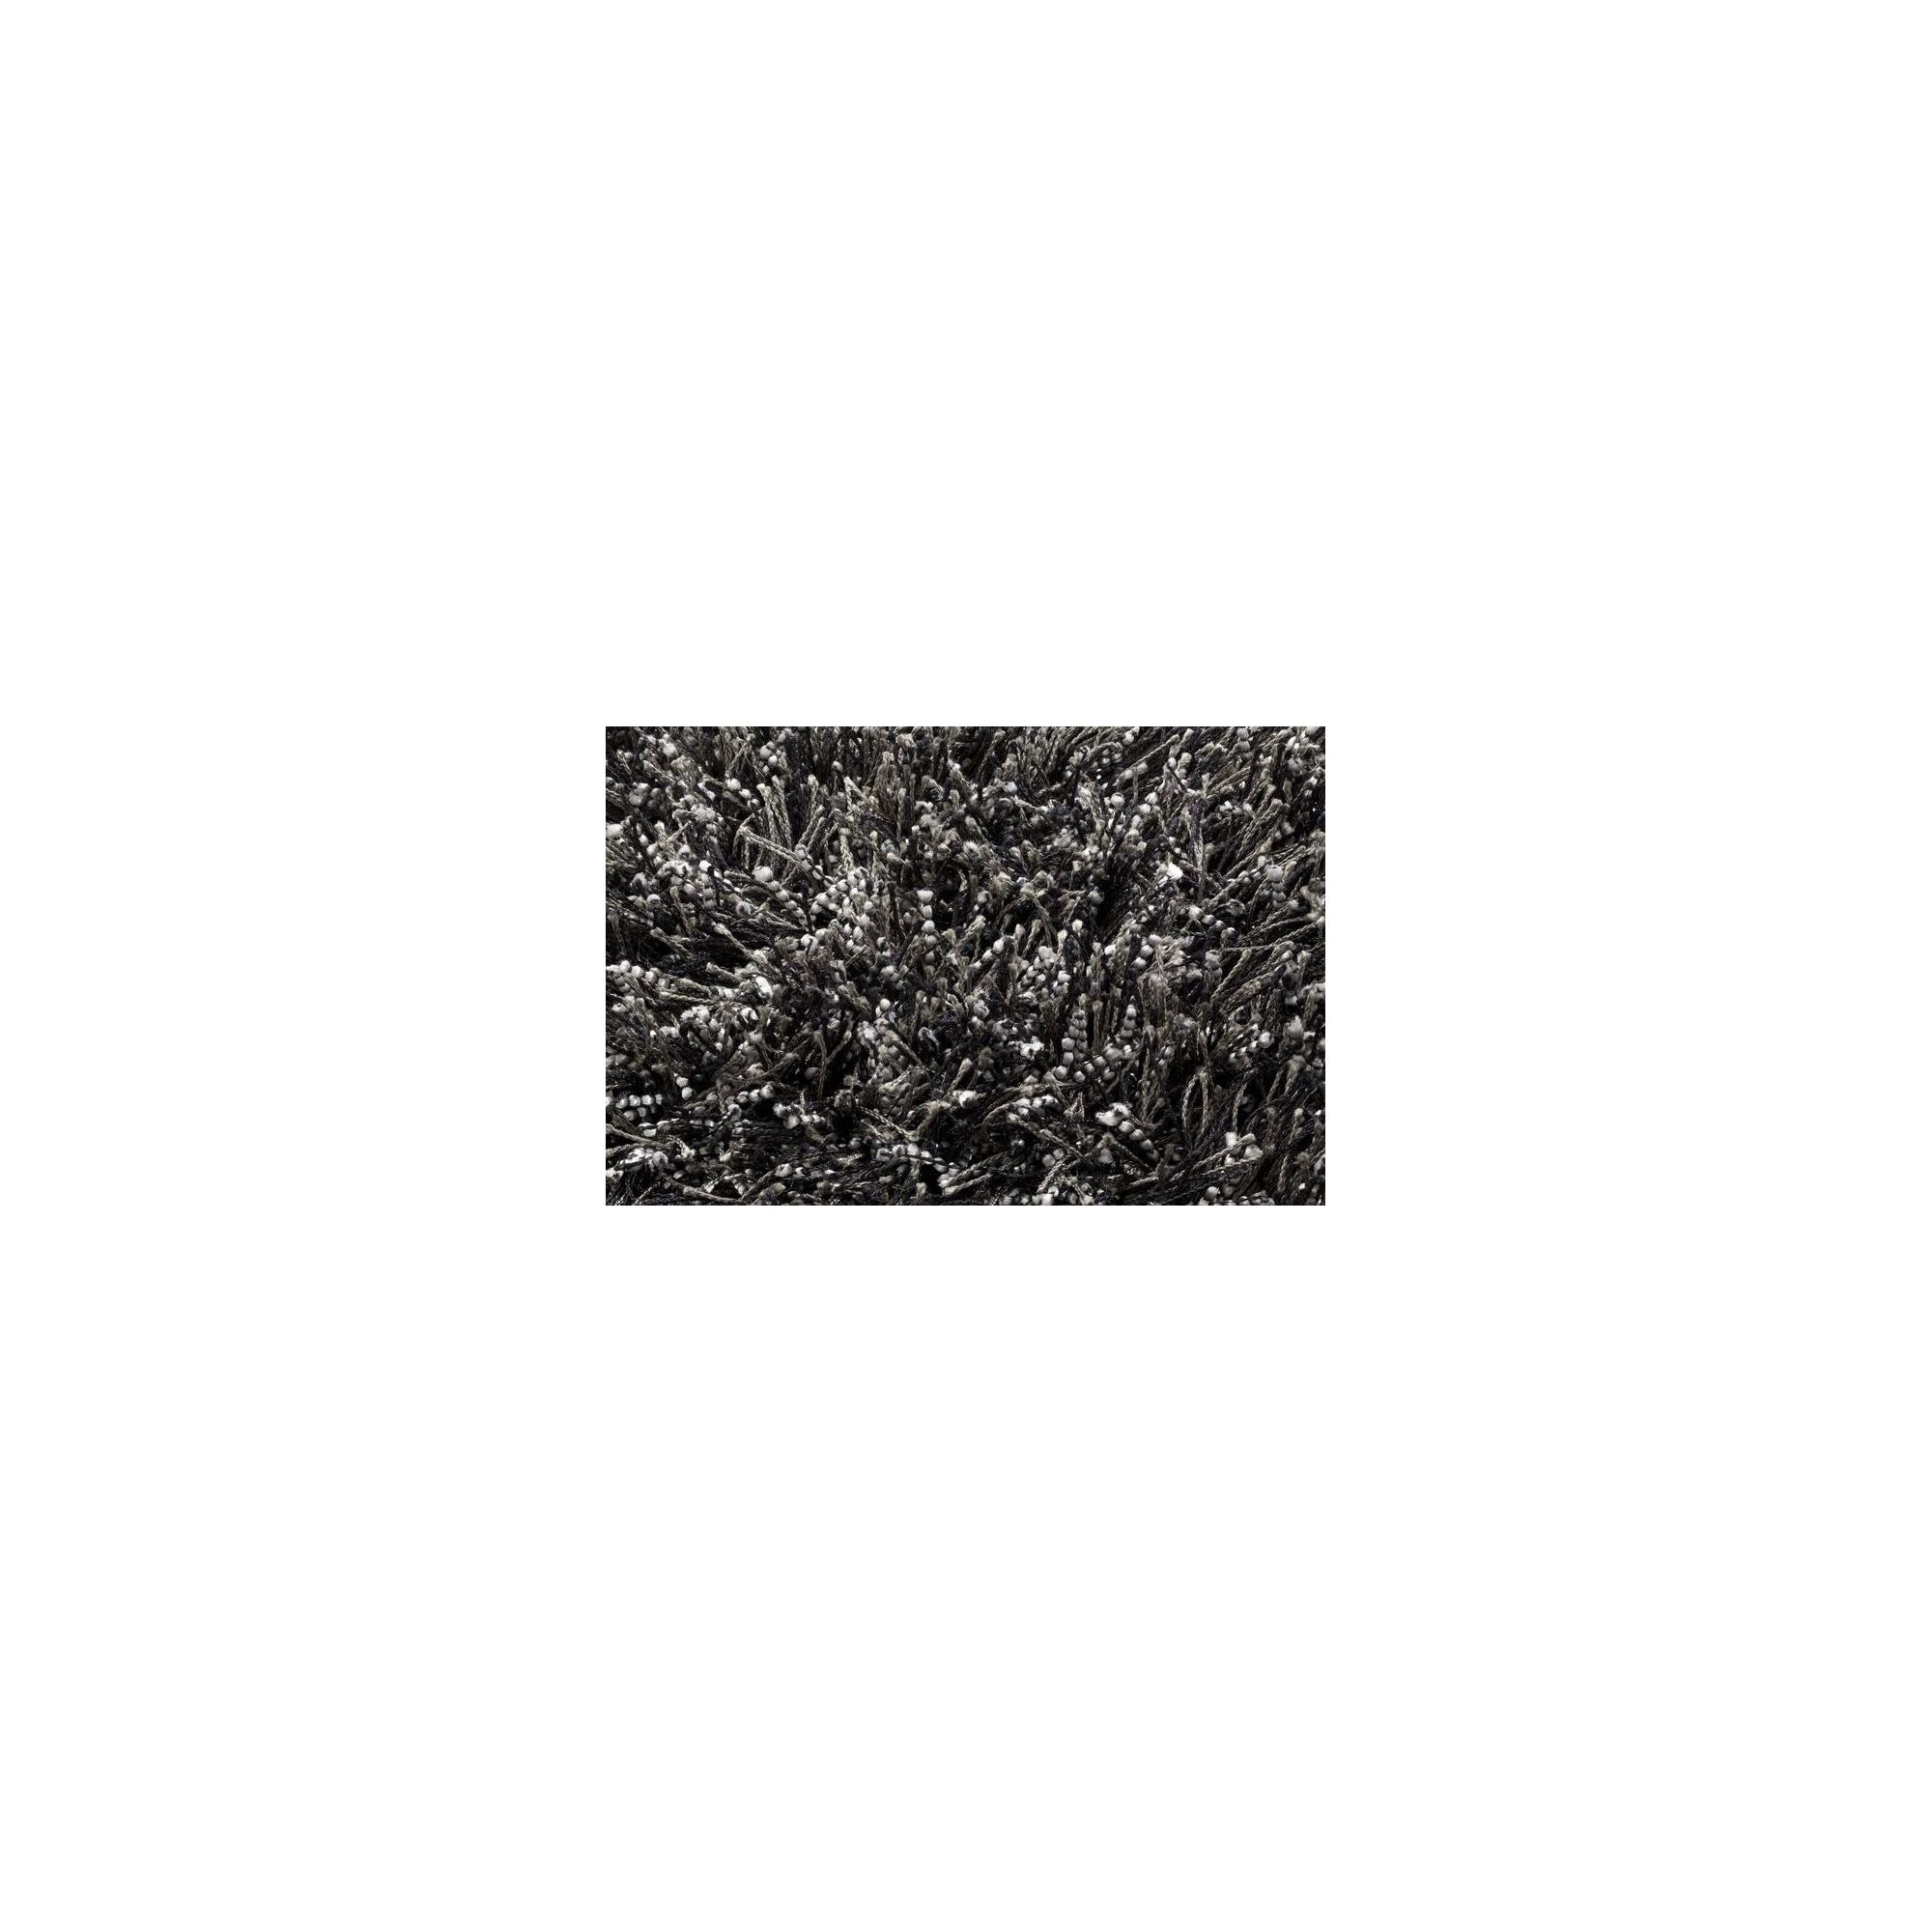 Linie Design Sprinkle Black Shag Rug - 300cm x 200cm at Tesco Direct